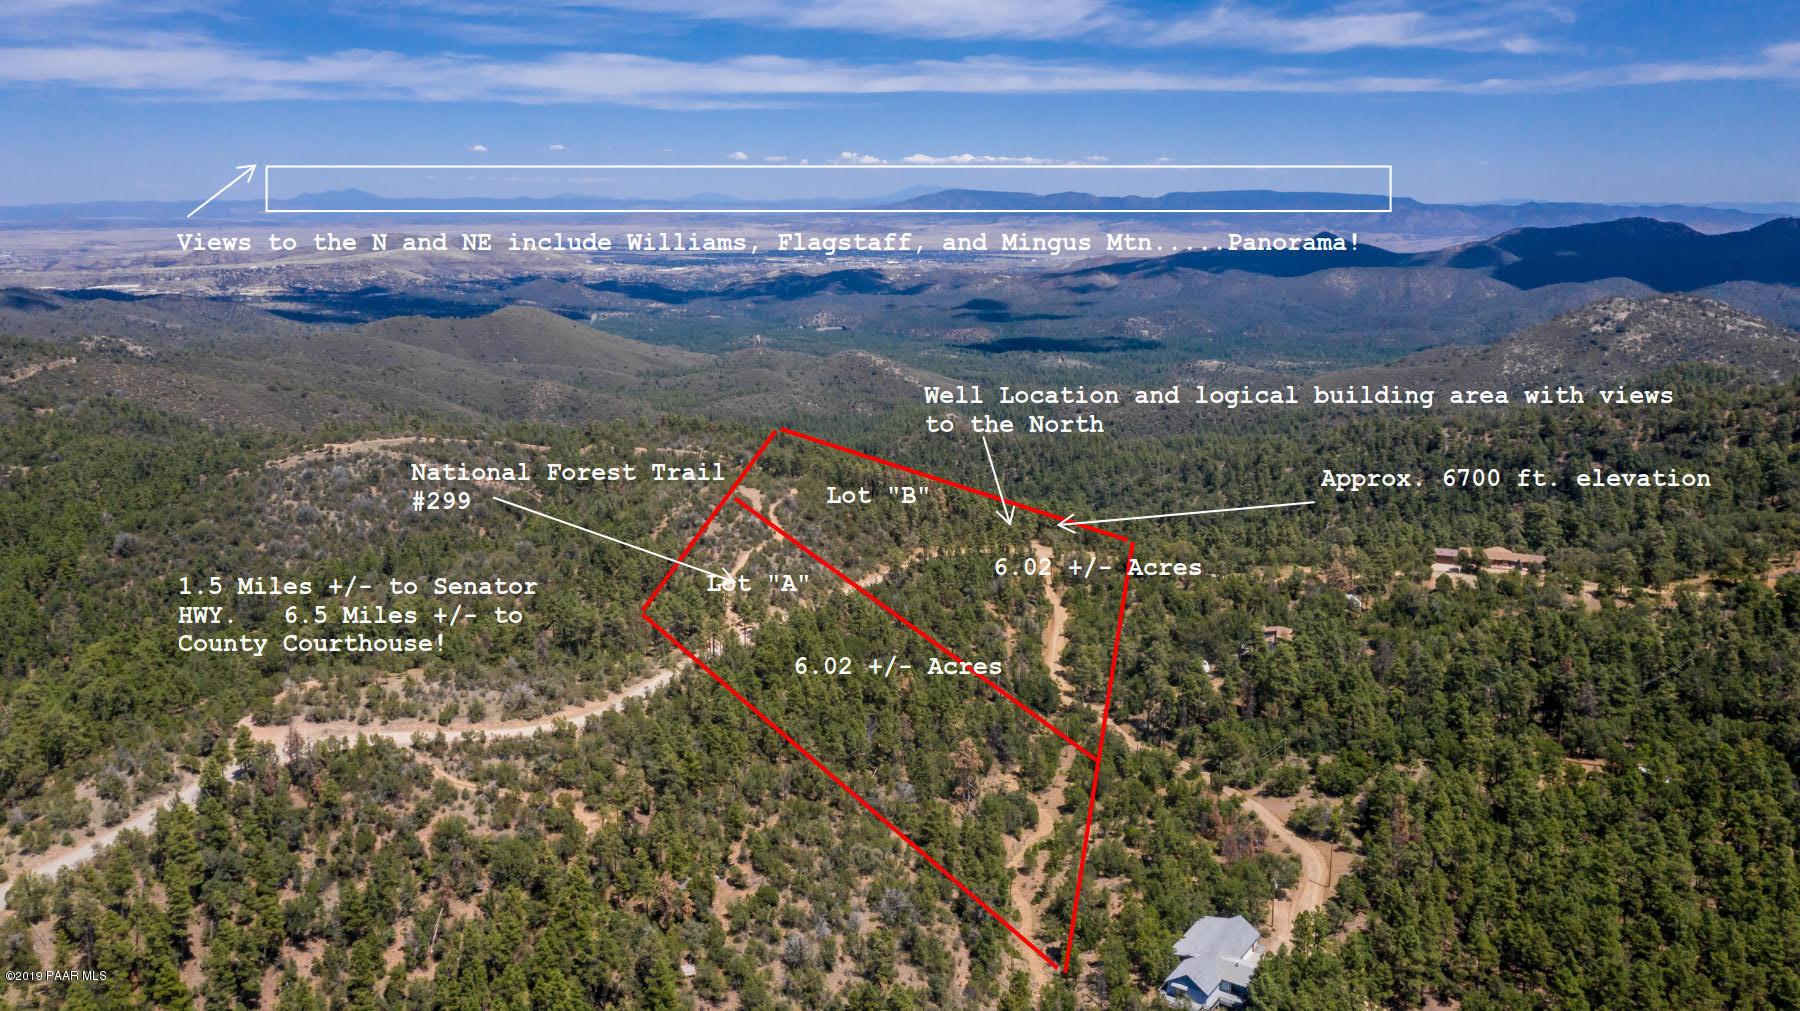 Photo of Spruce Mountain Lot A, Prescott, AZ 86303